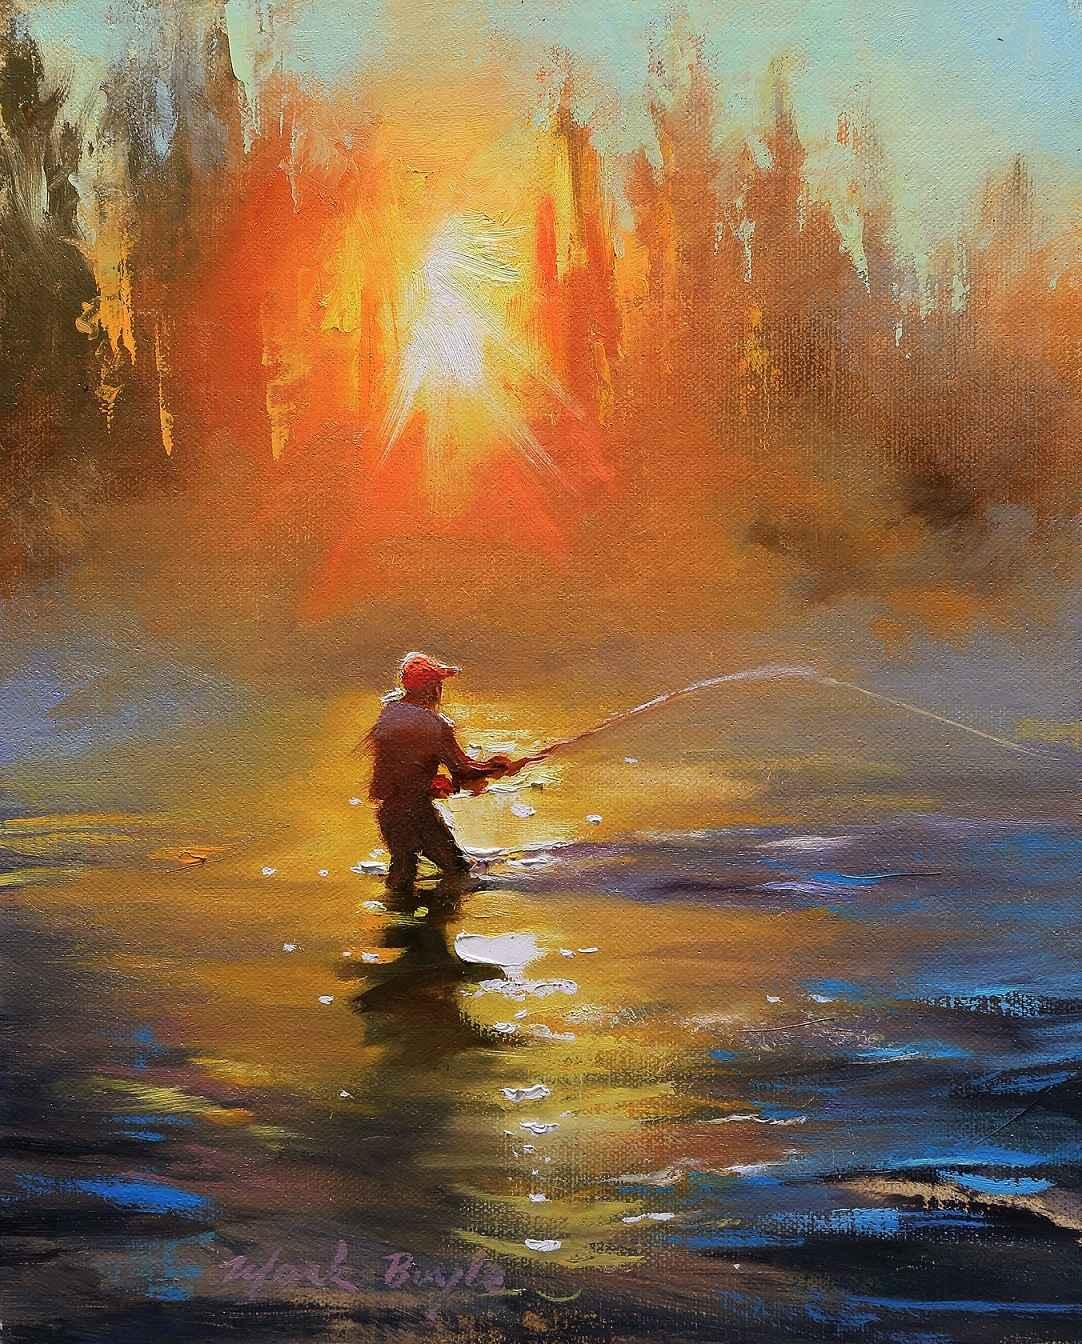 Fiery Sunset  by Mr Mark Boyle